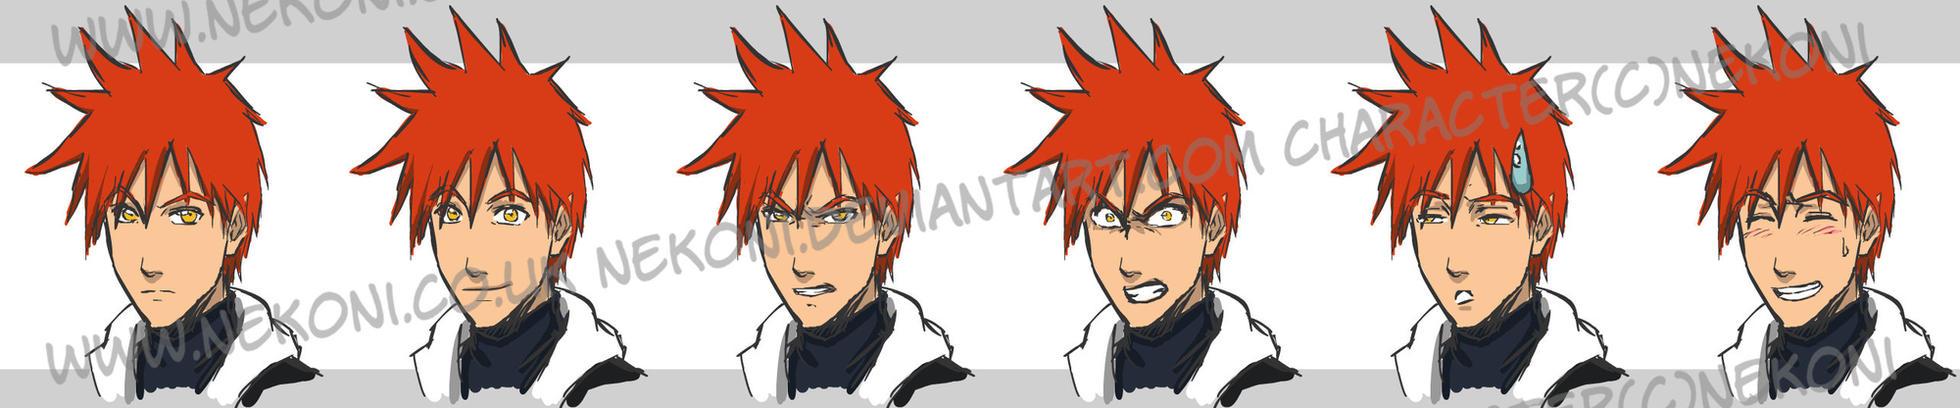 Fox Expressions by nekoni